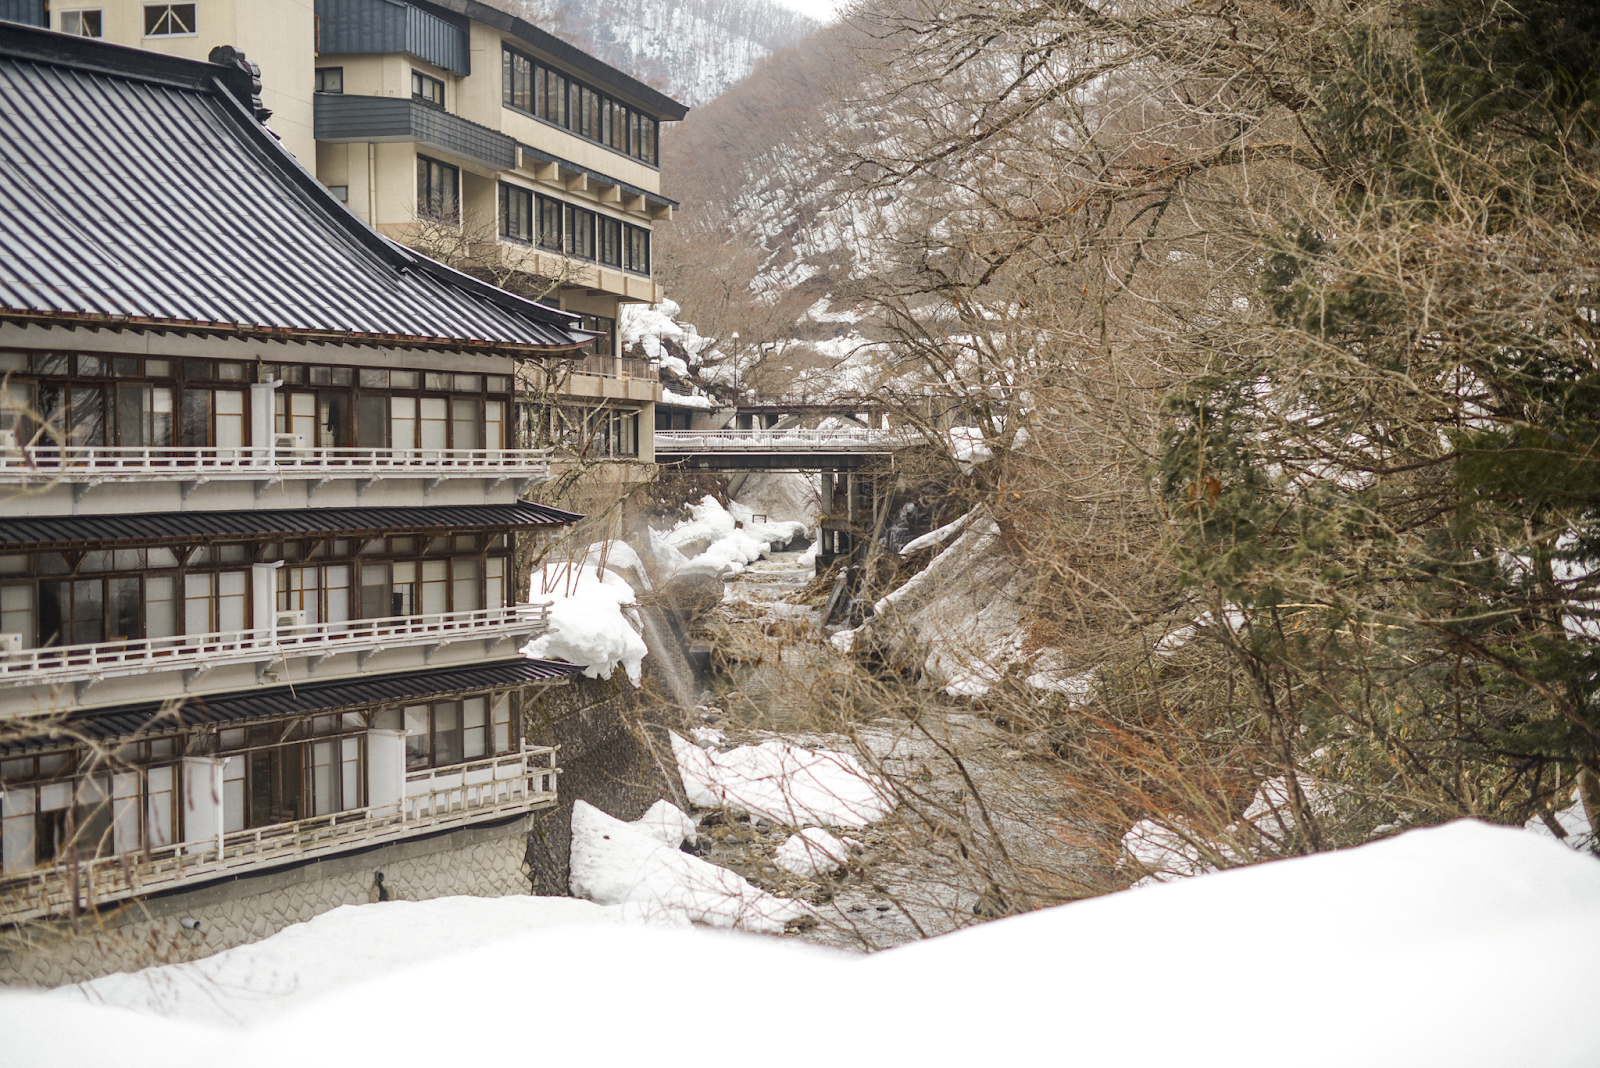 Biggest open-air bath onsen in Japan. Takaragawa Onsen, Minakami Gunma, Japan / FOREVERVANNY.com